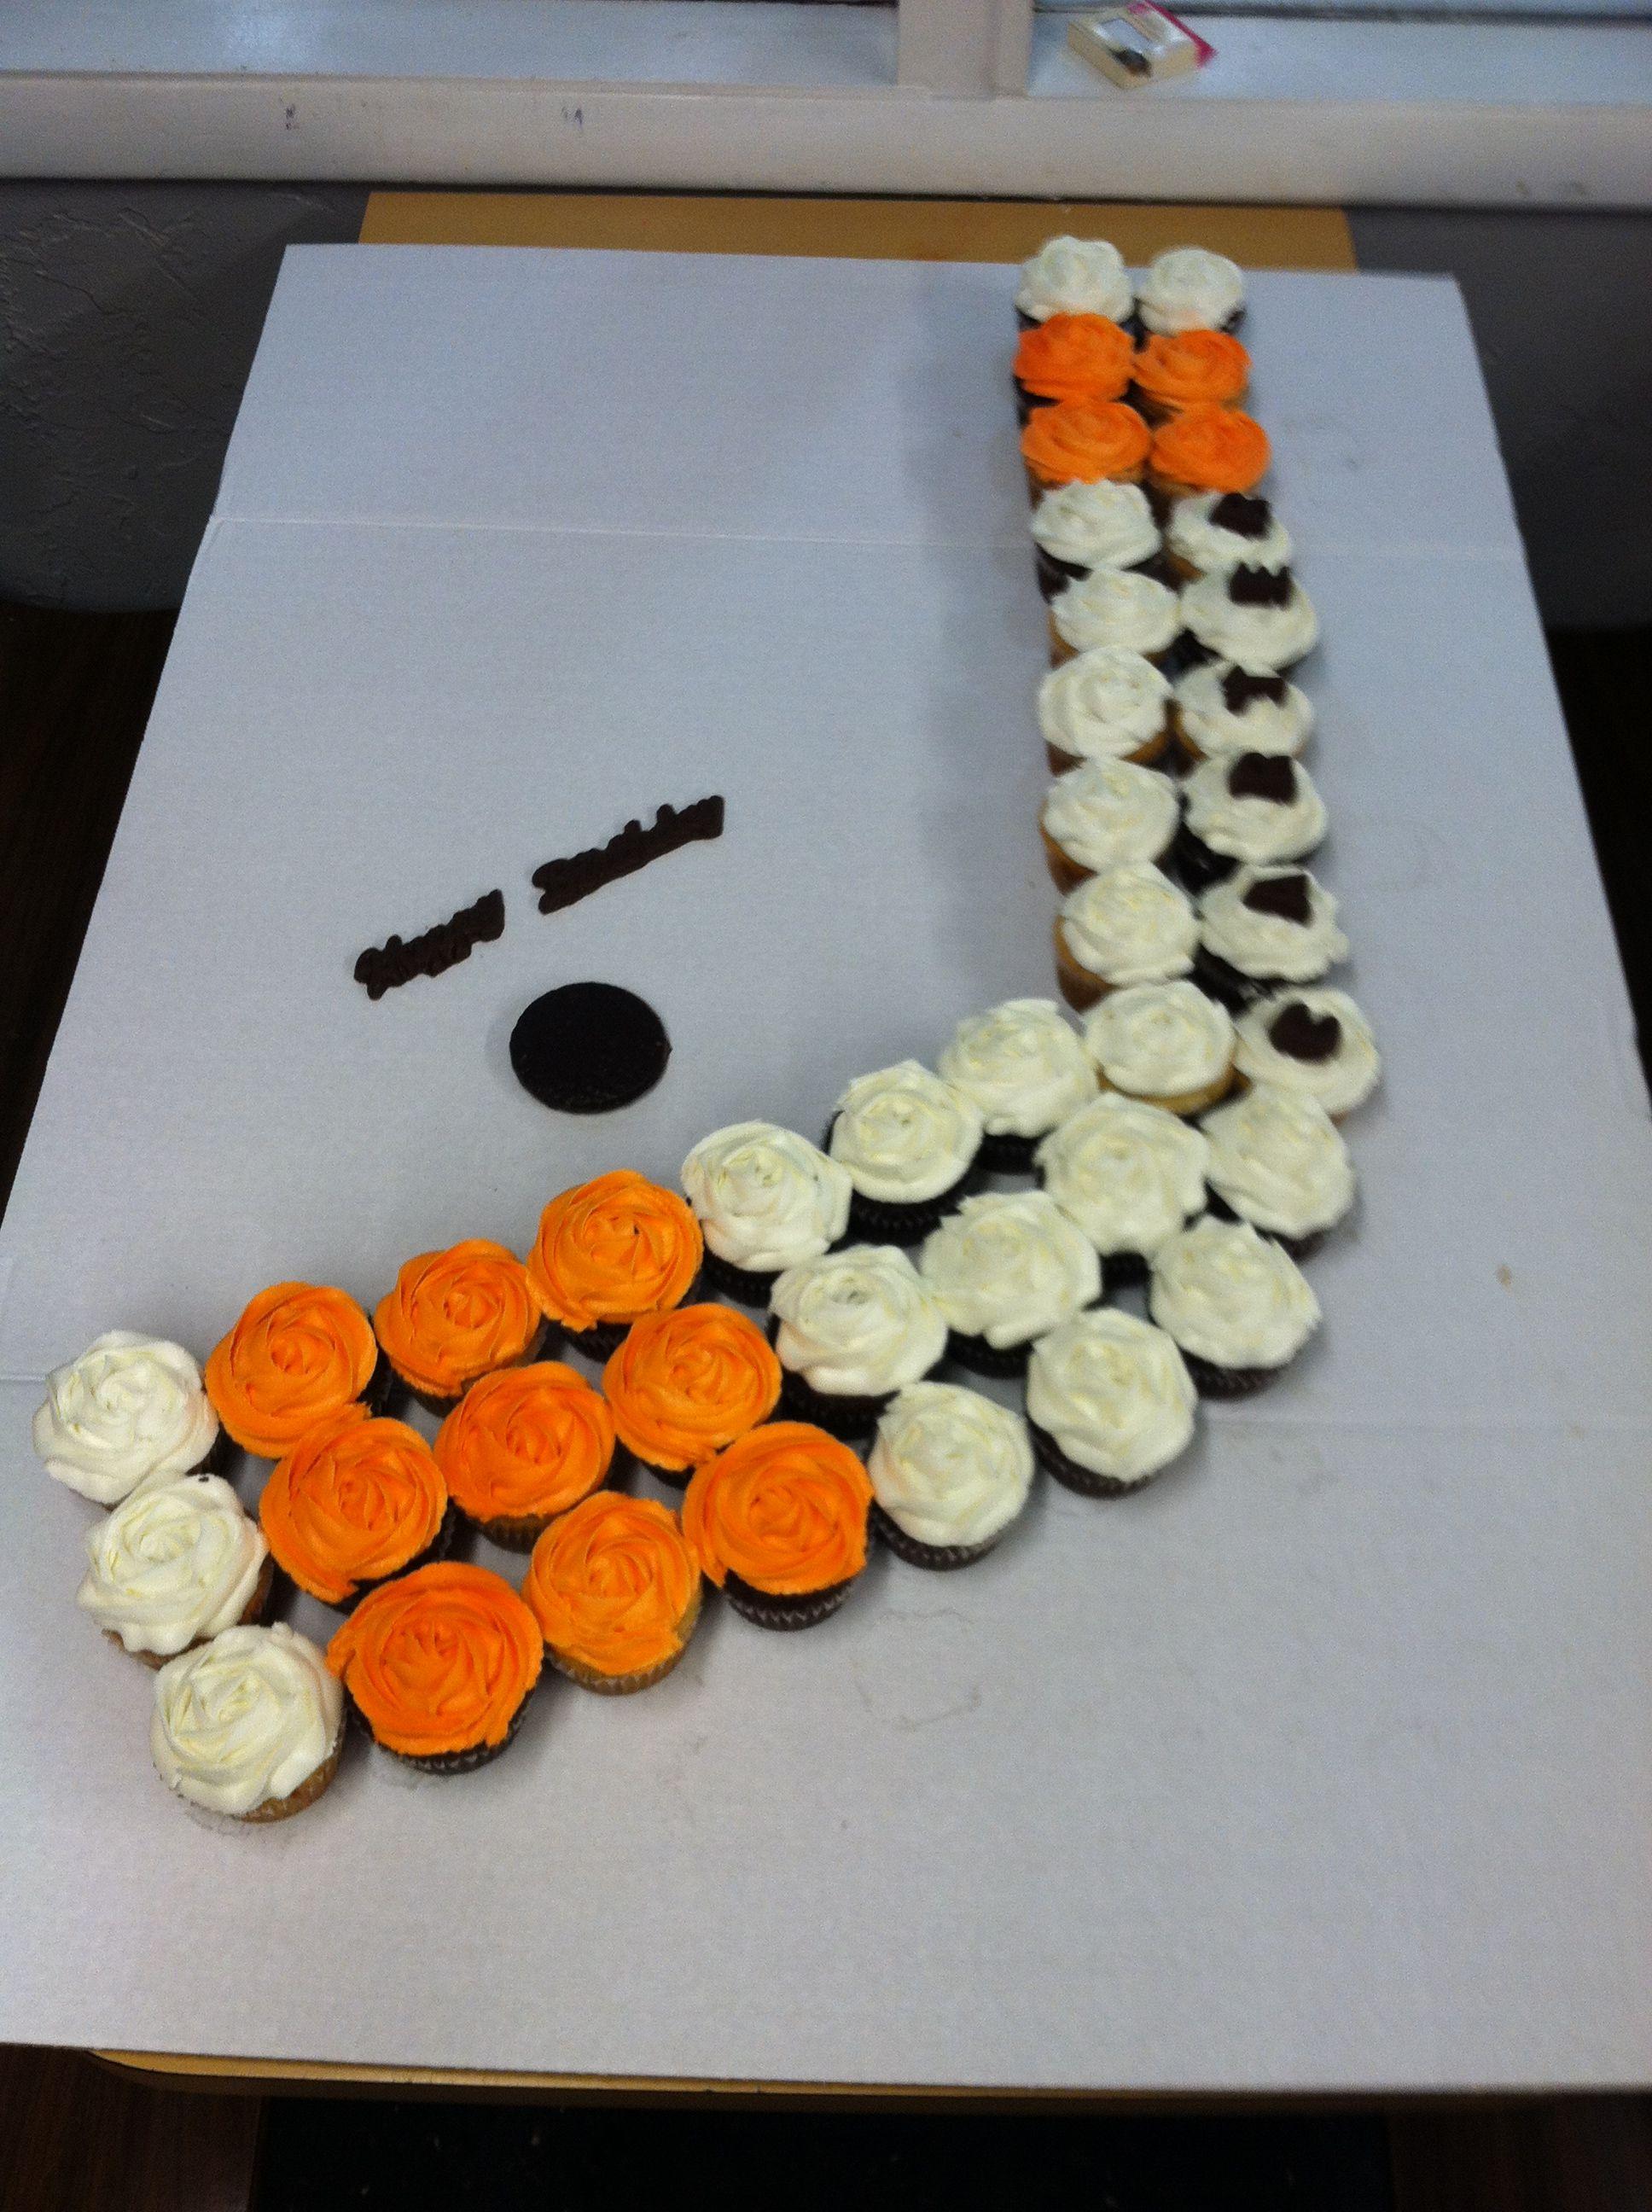 Field Hockey Stick Cake Decorations